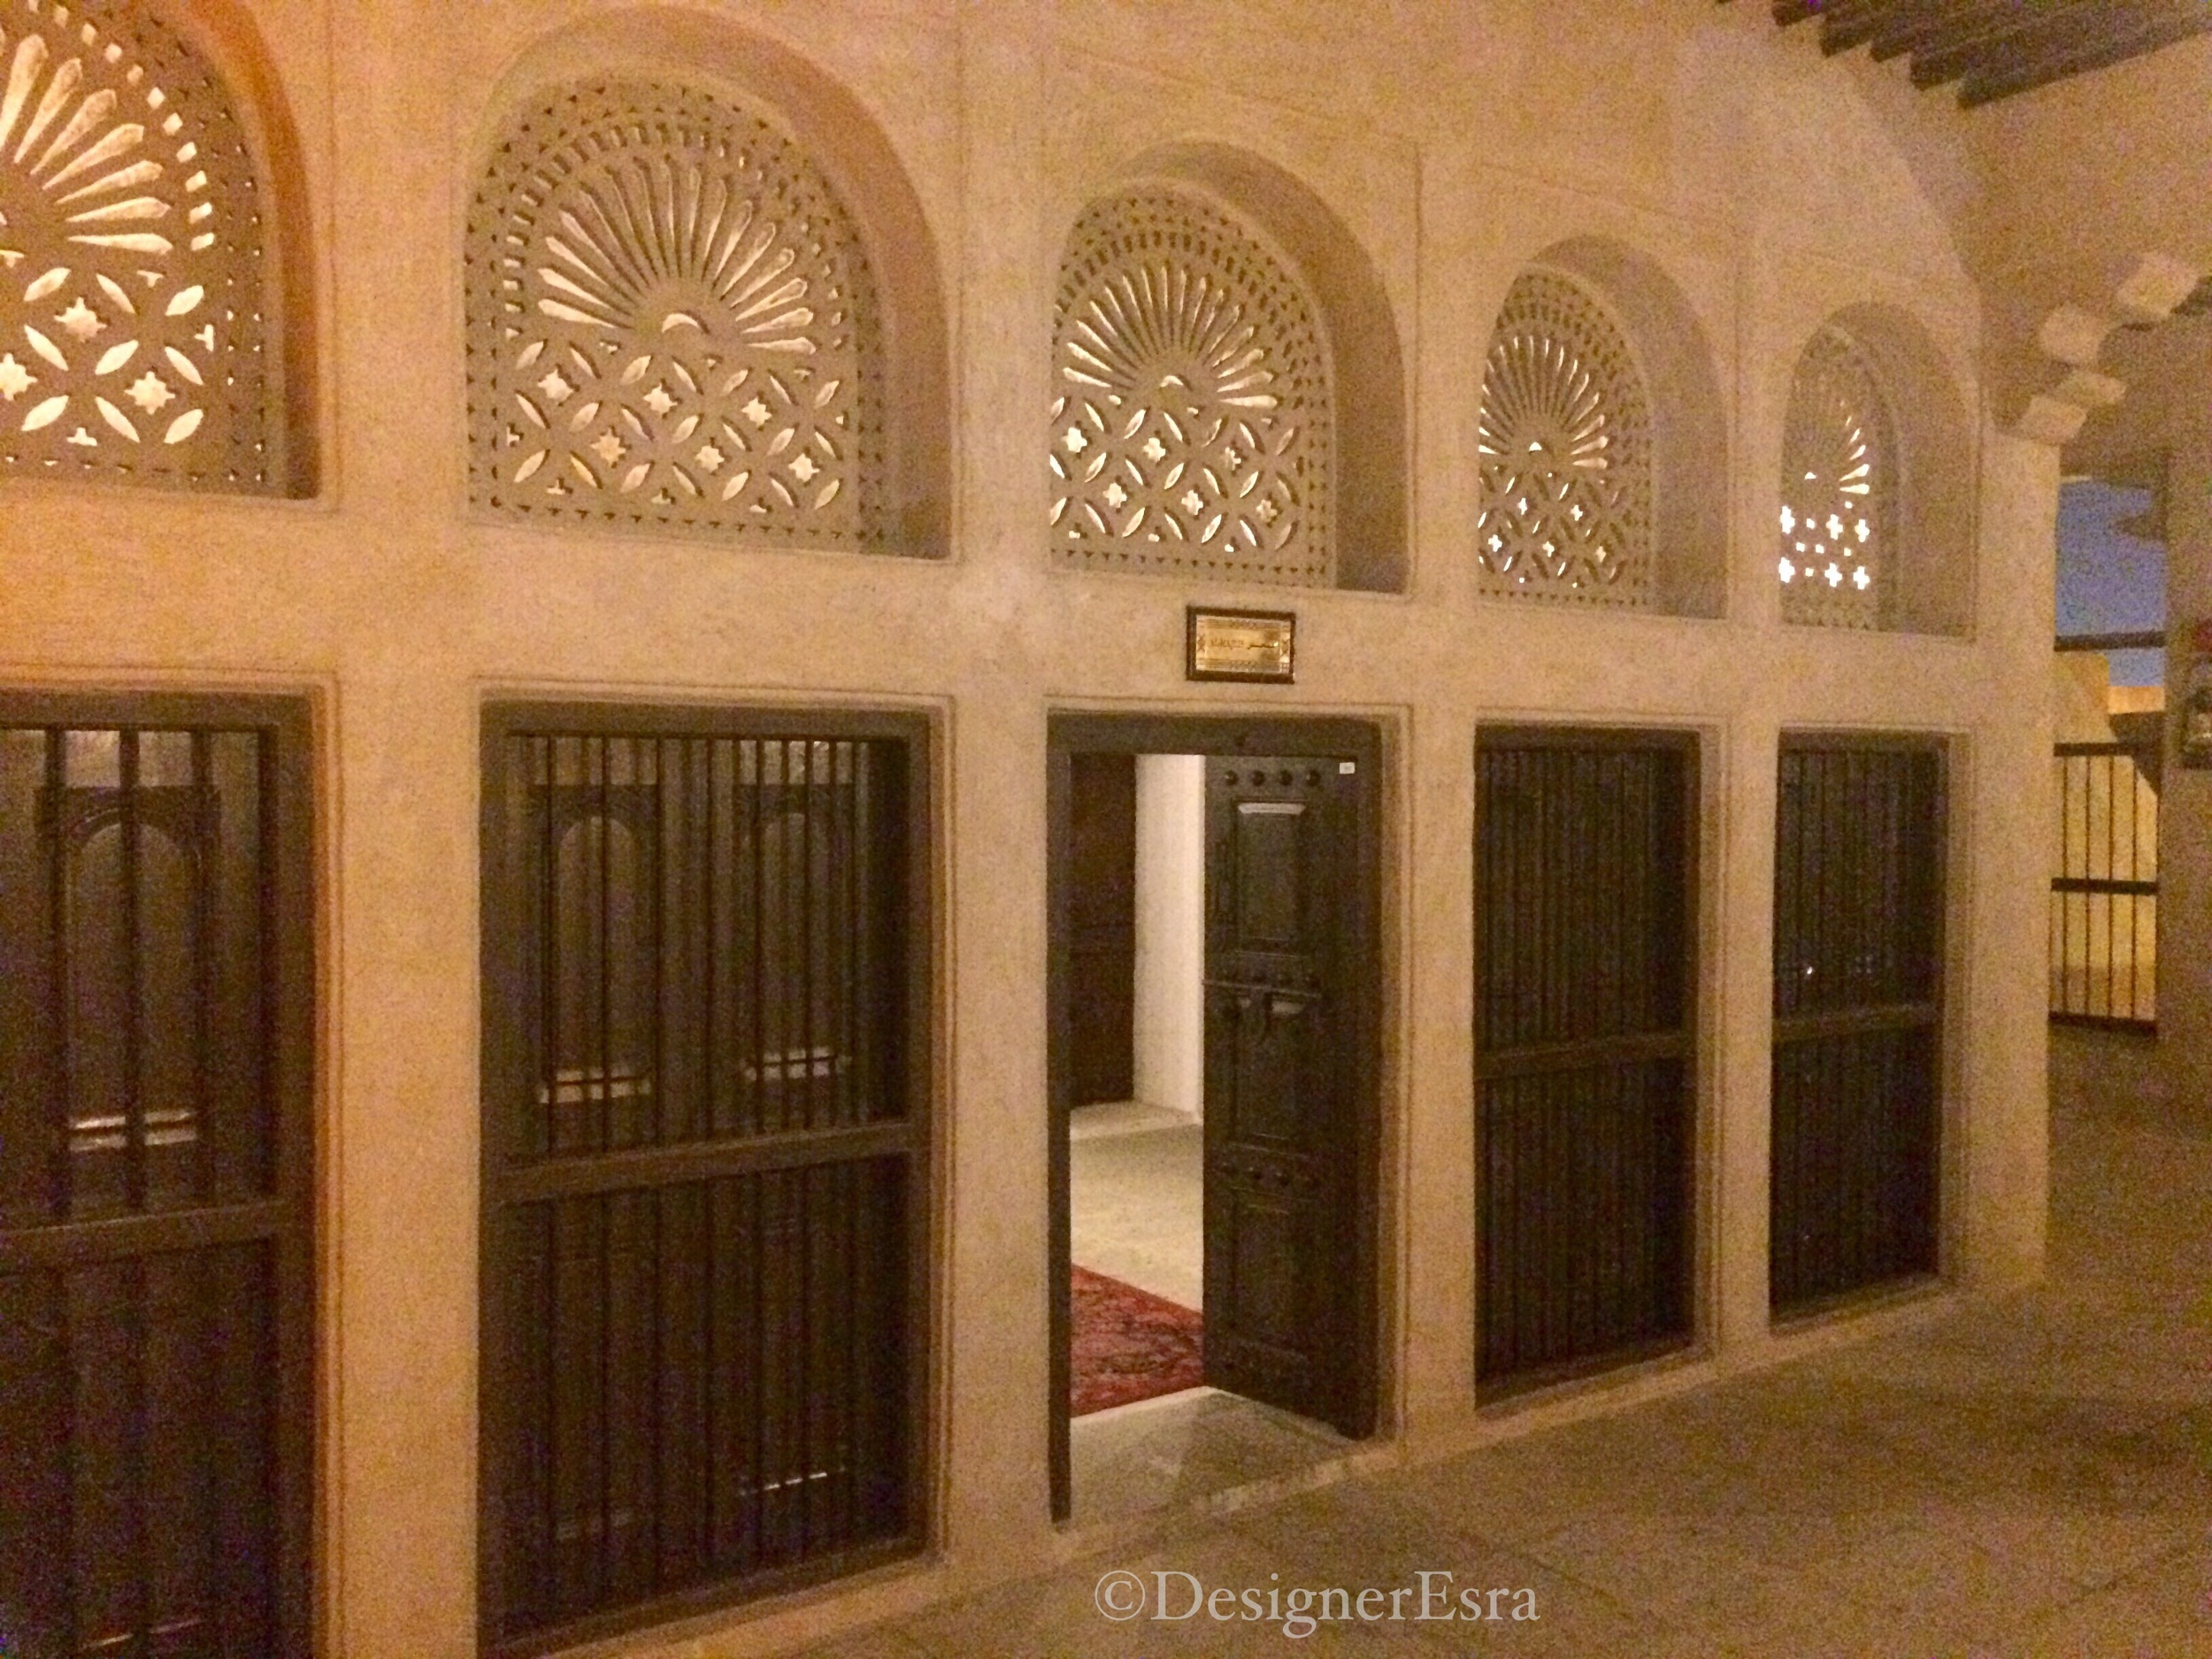 Geometric Patterns in Traditional Arabian Gulf Houses